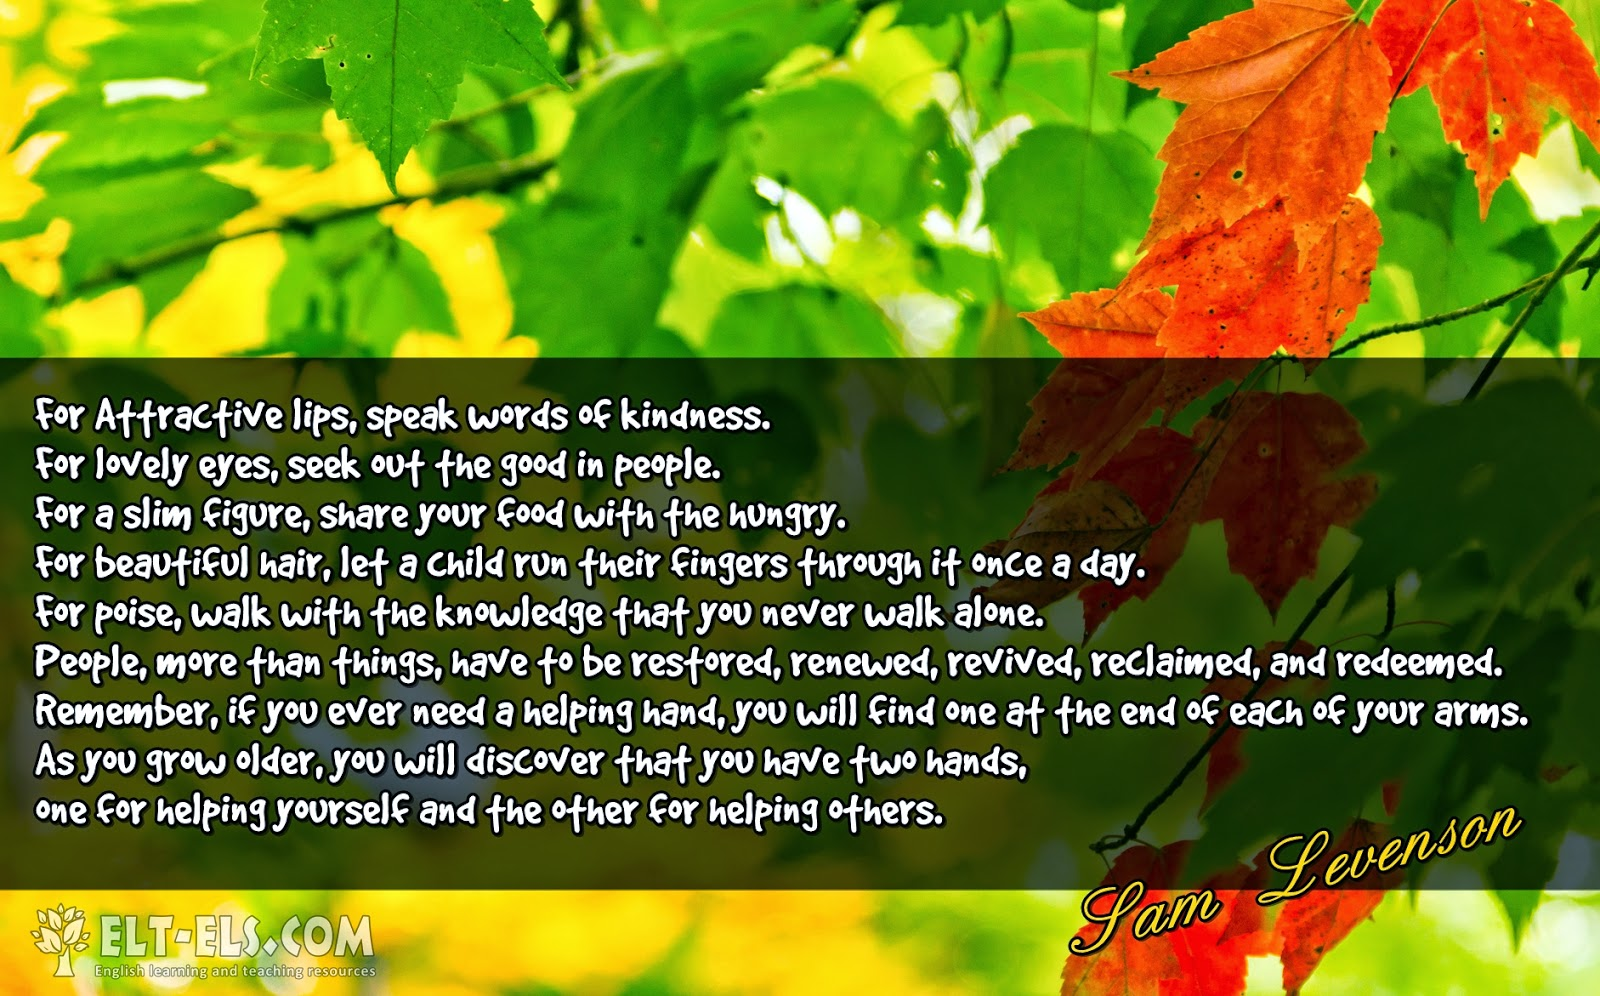 Keys Of Happiness